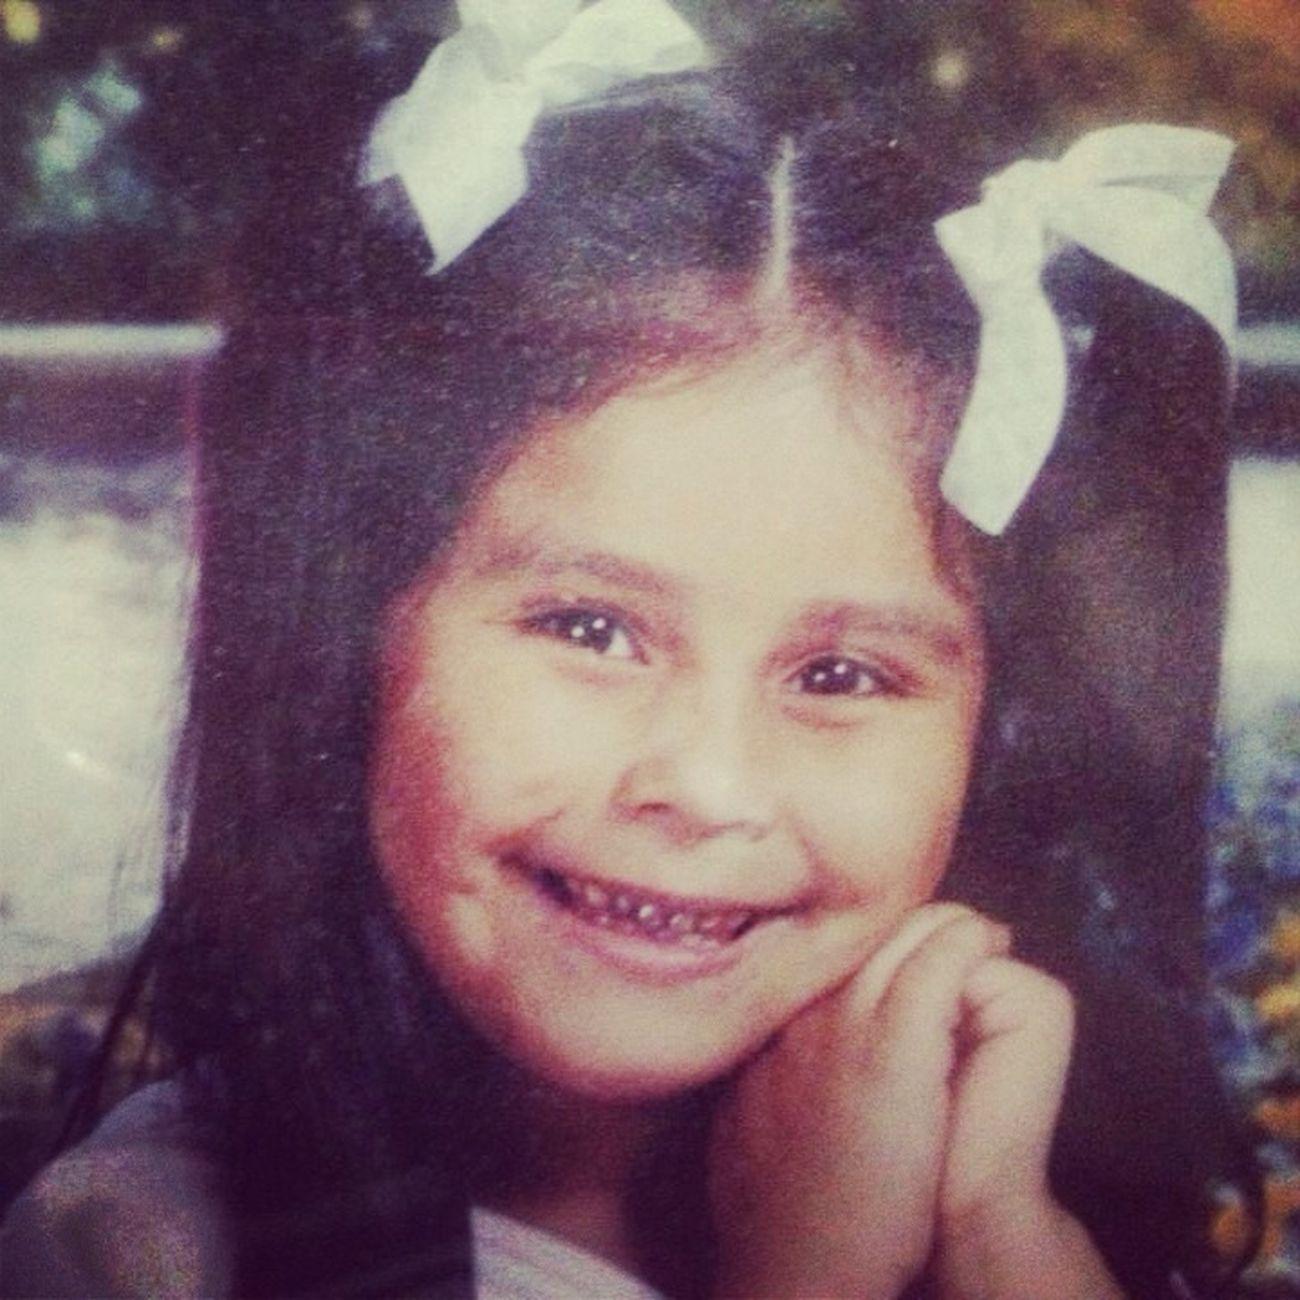 Little Madison